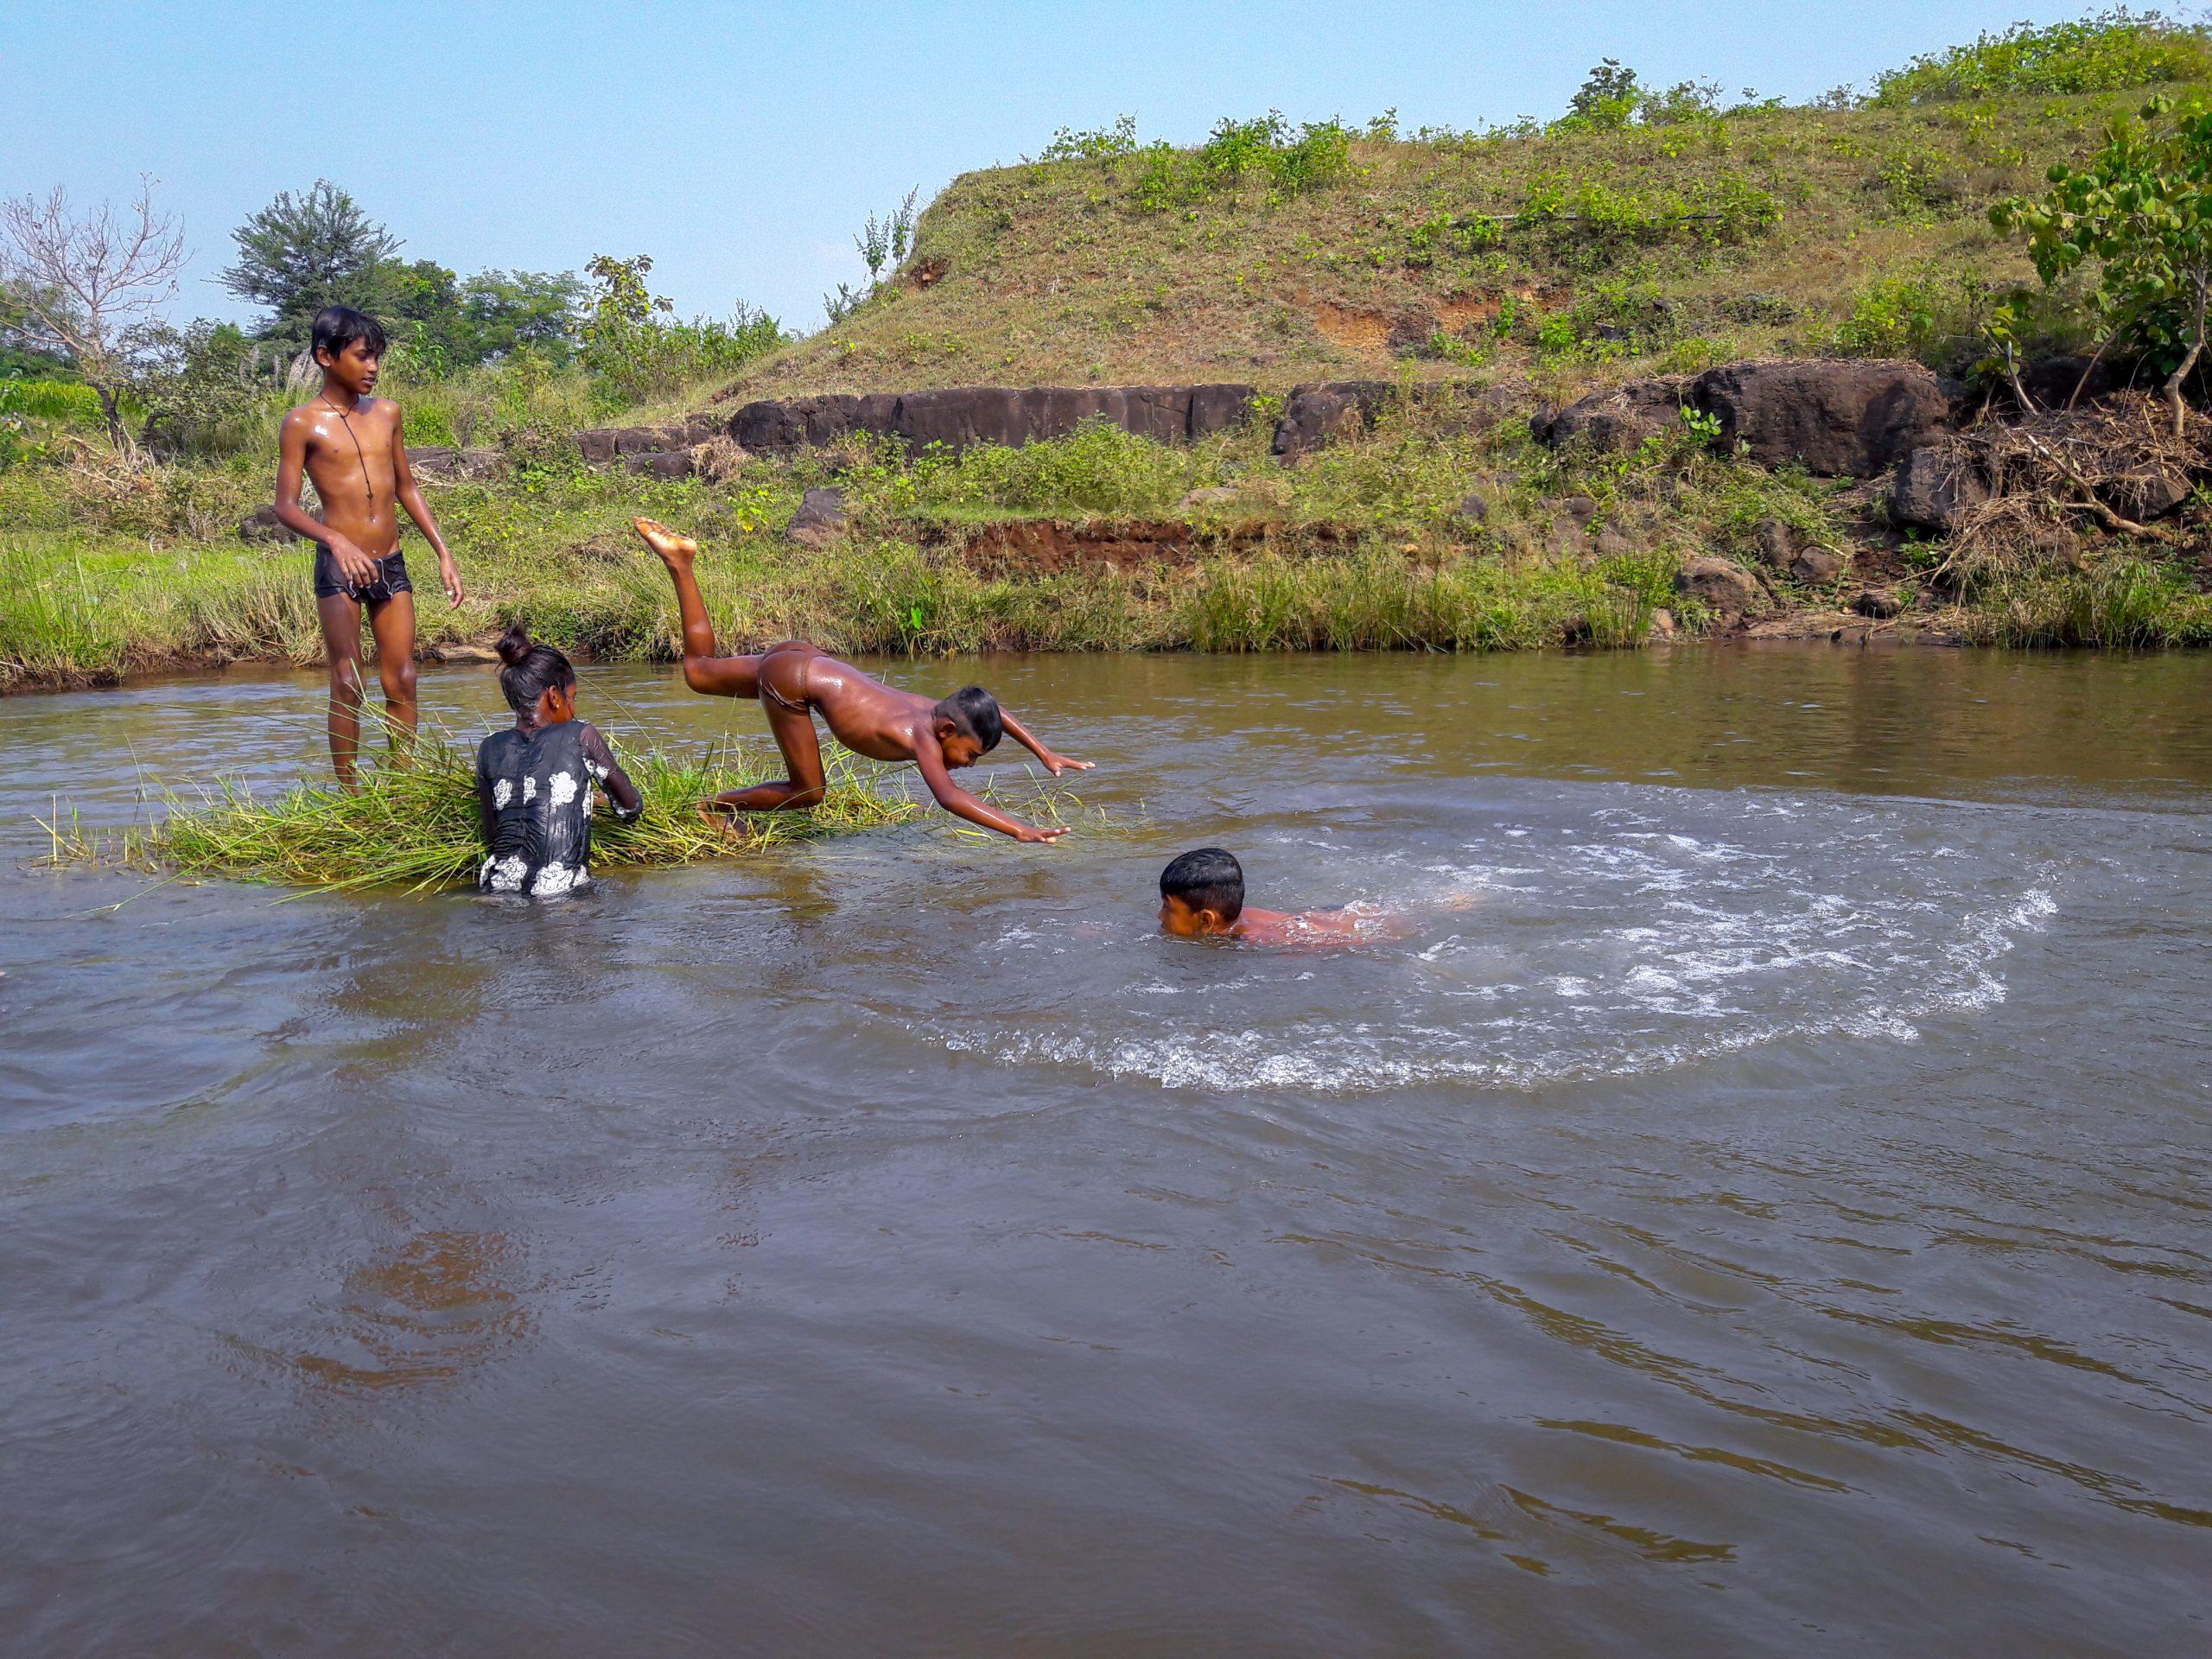 A village children swimming in a river